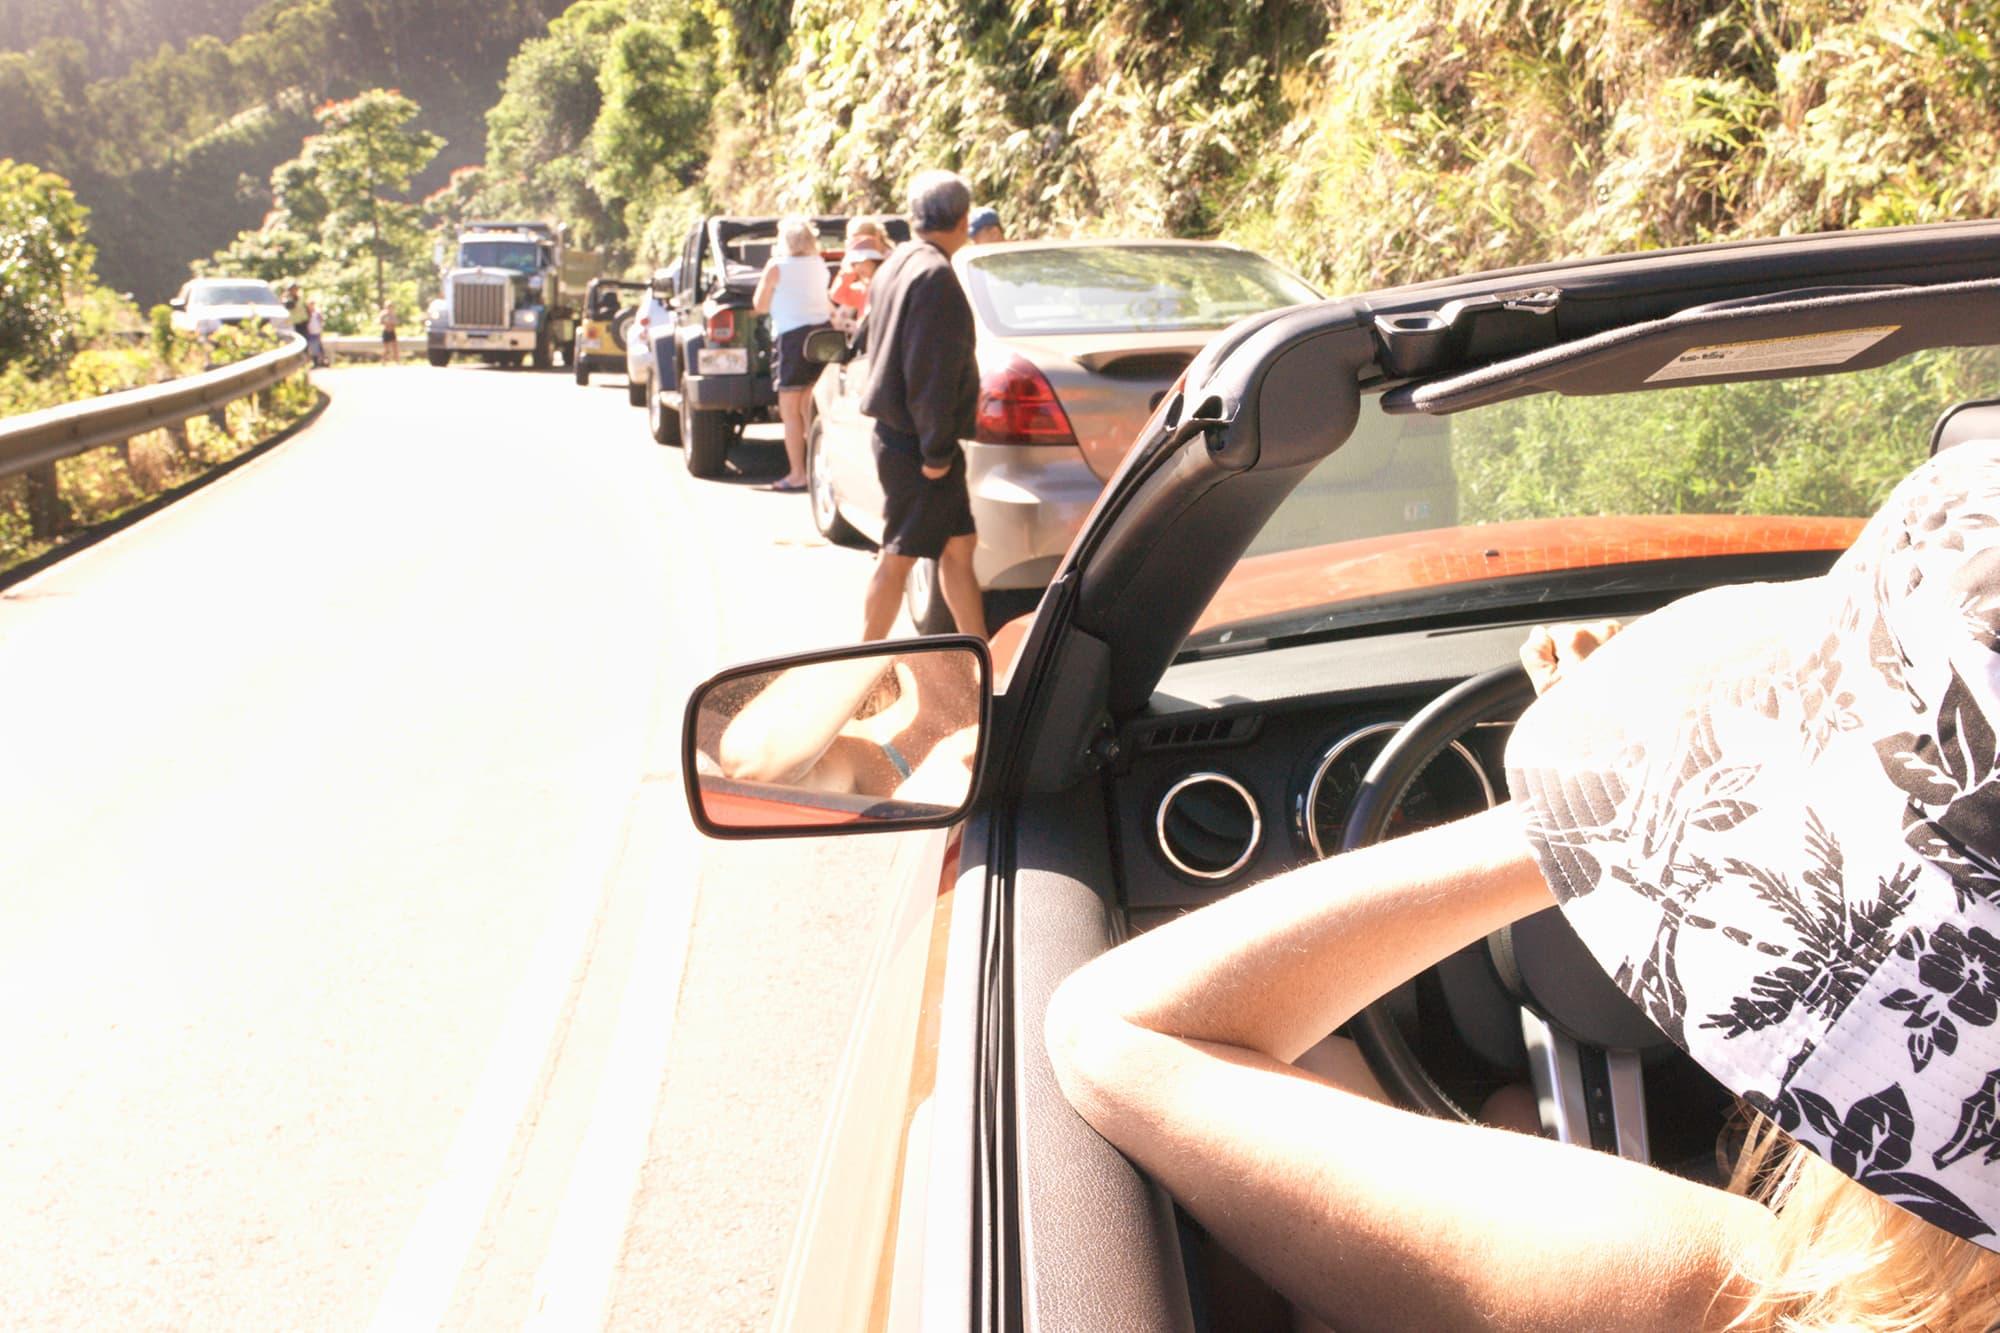 Traffic in Hawaii.